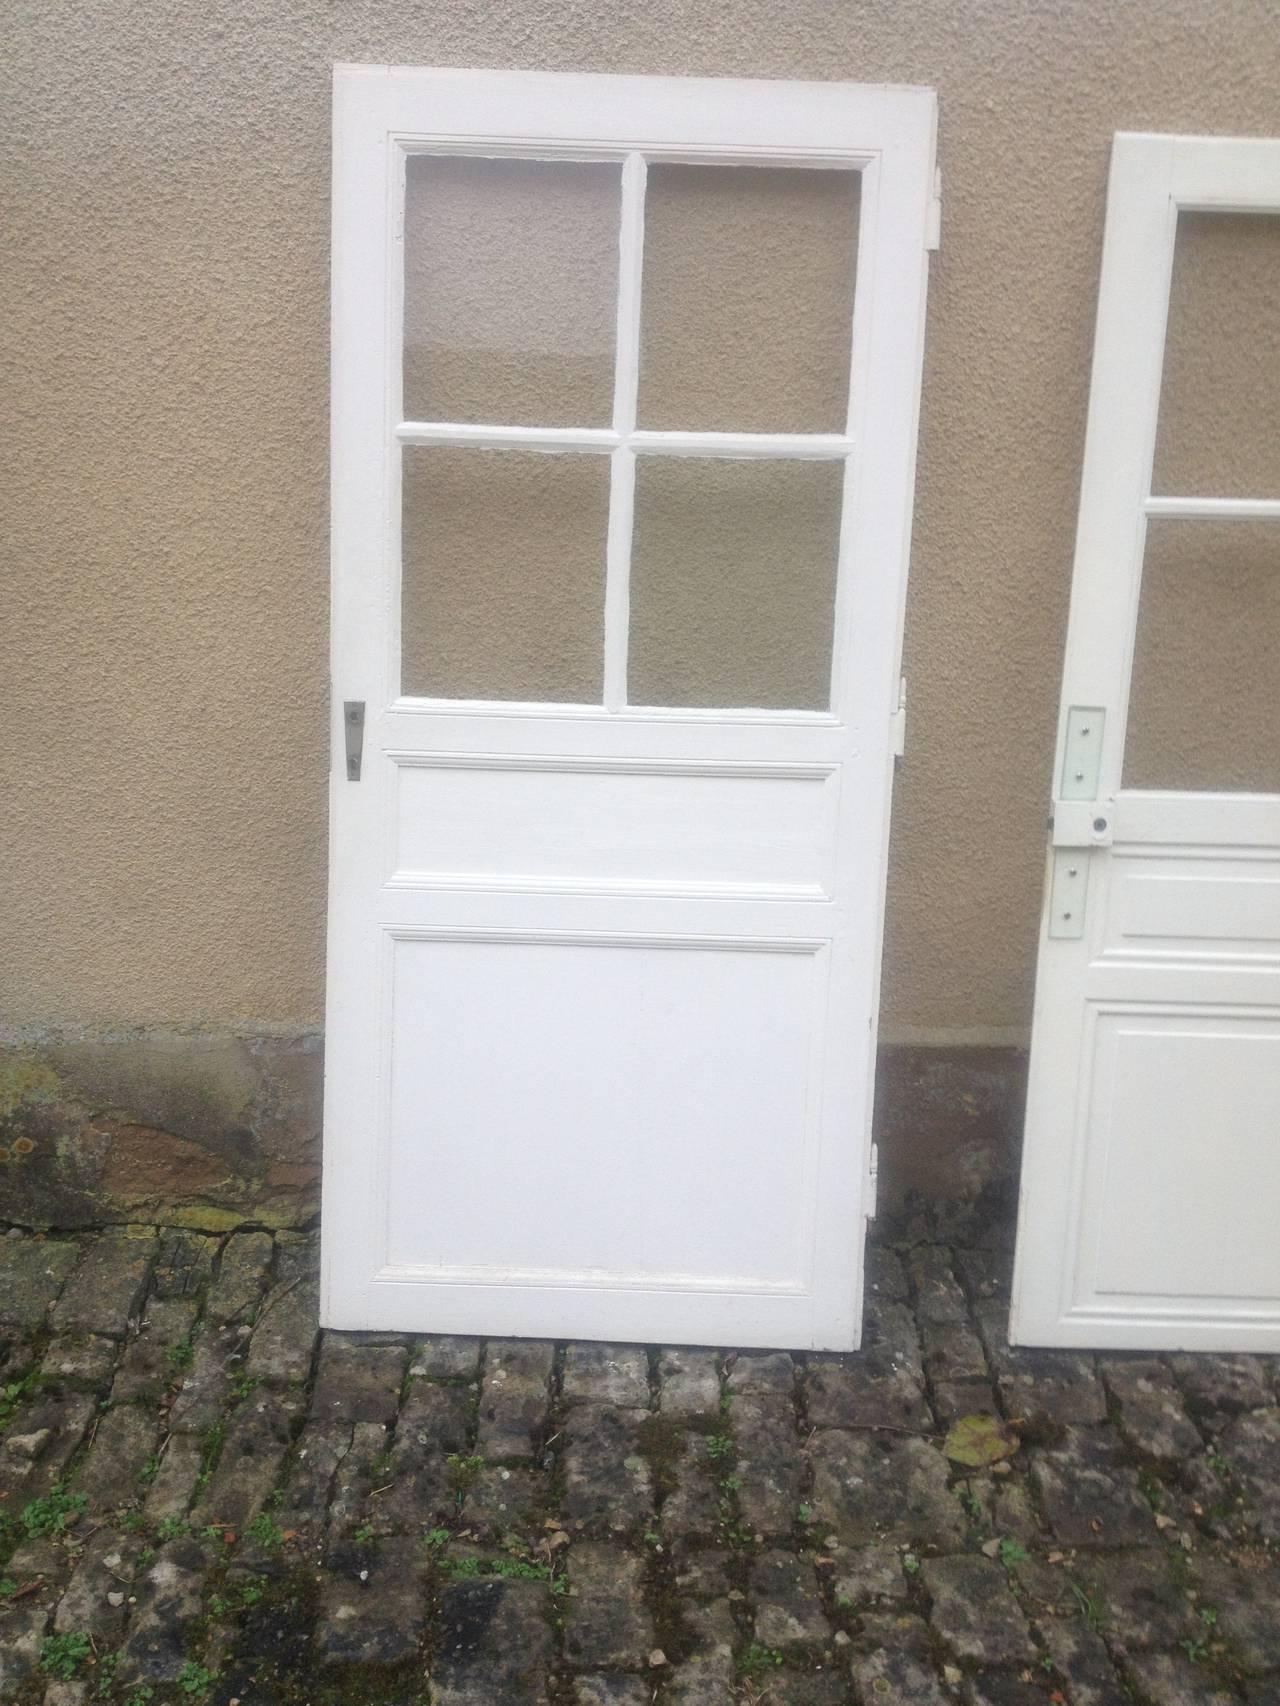 Three french louis philippe style interior doors handcrafted wood three french louis philippe style interior doors handcrafted wood paris france for sale planetlyrics Choice Image